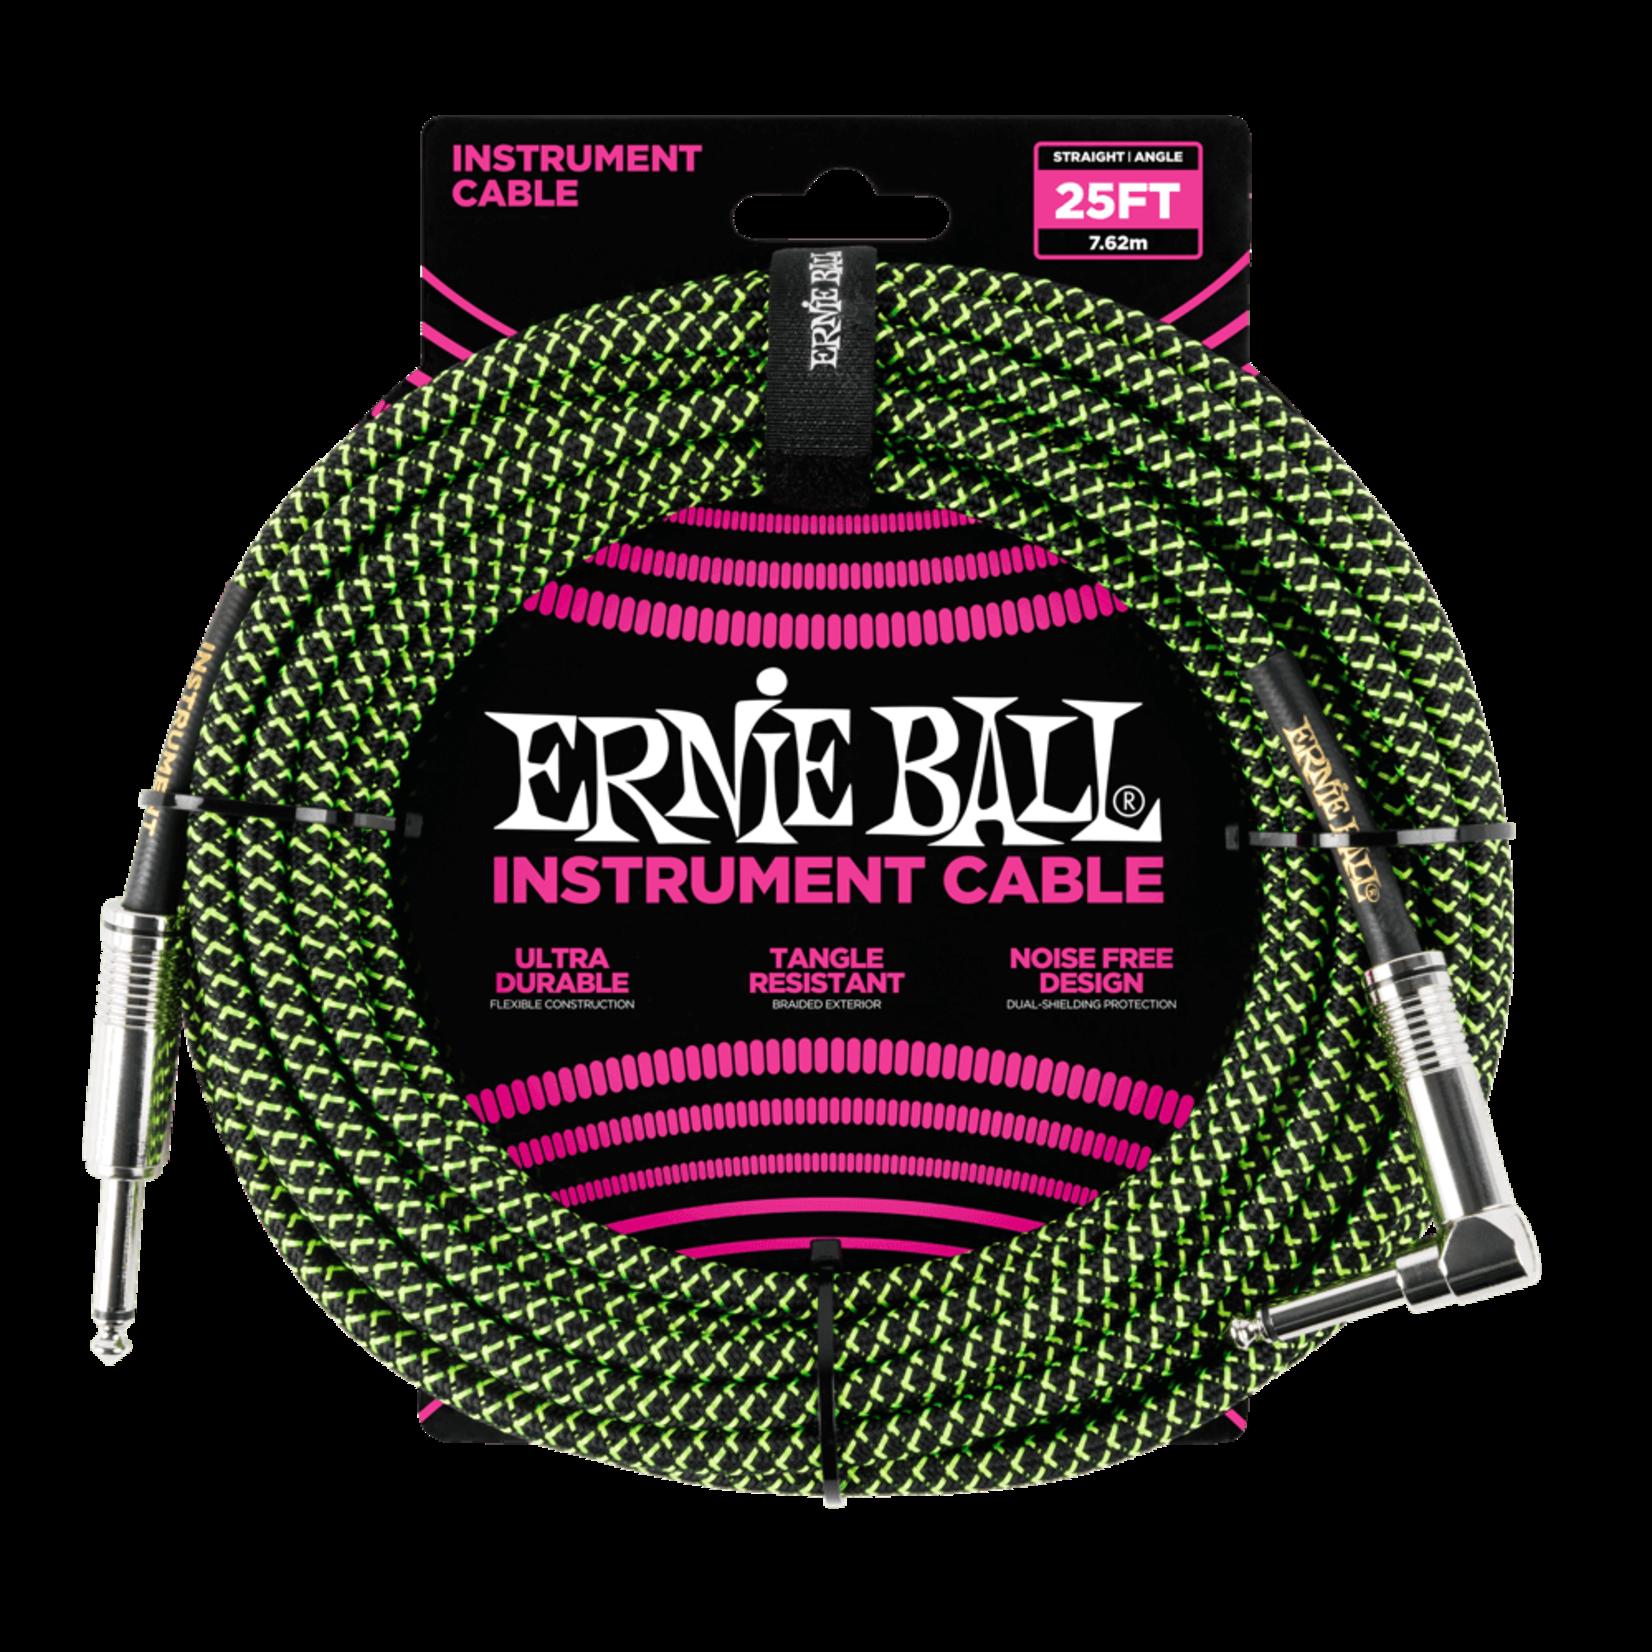 ERNIE BALL 6066EB 25' STRGHT/ANGLE GREEN